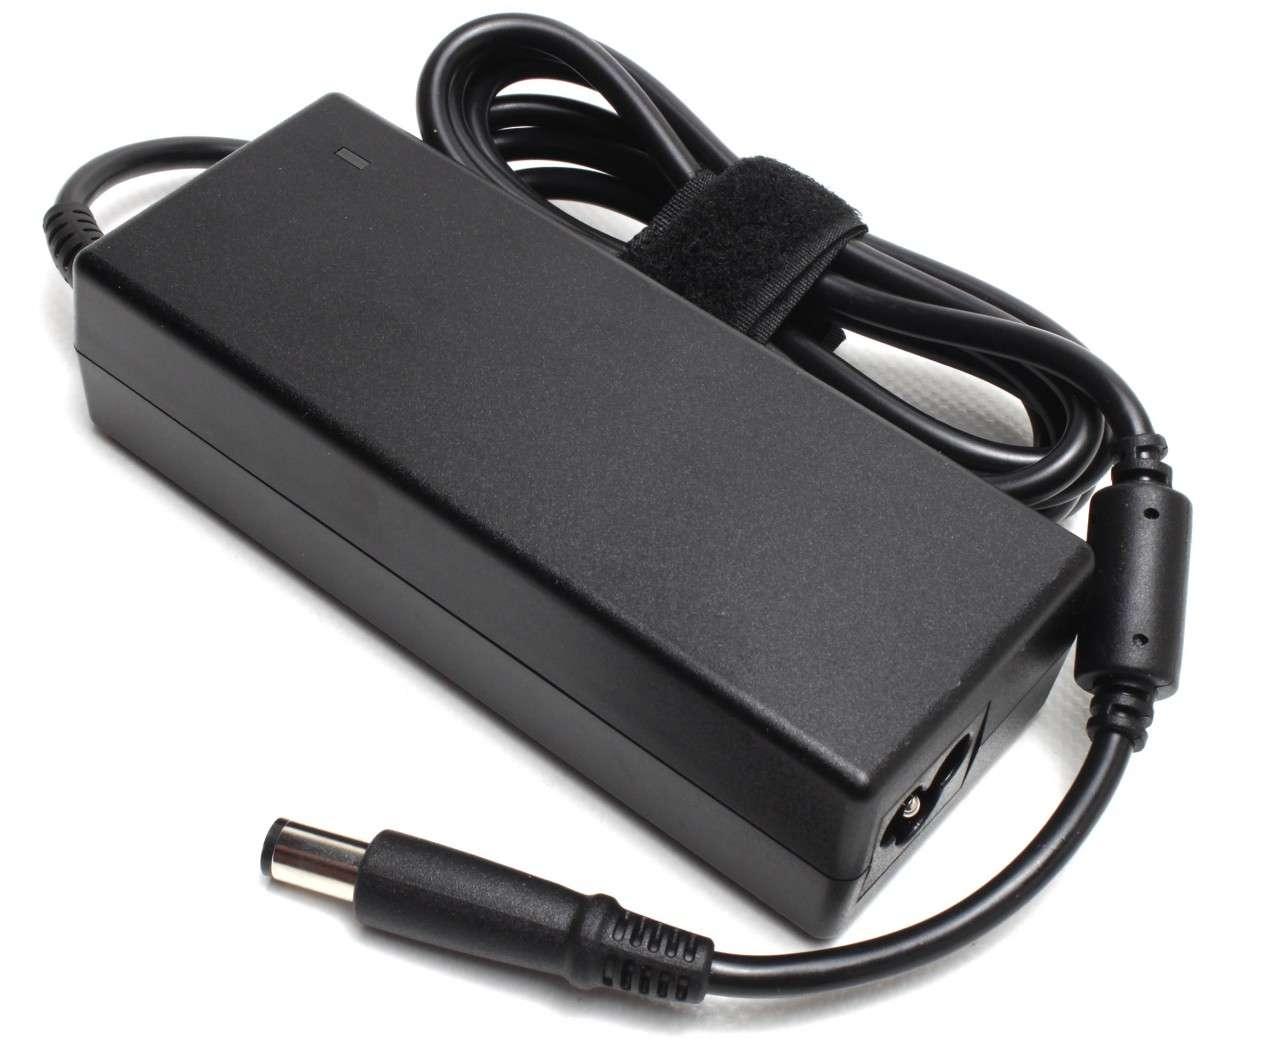 Incarcator Dell Inspiron N3010D VARIANTA 3 imagine powerlaptop.ro 2021